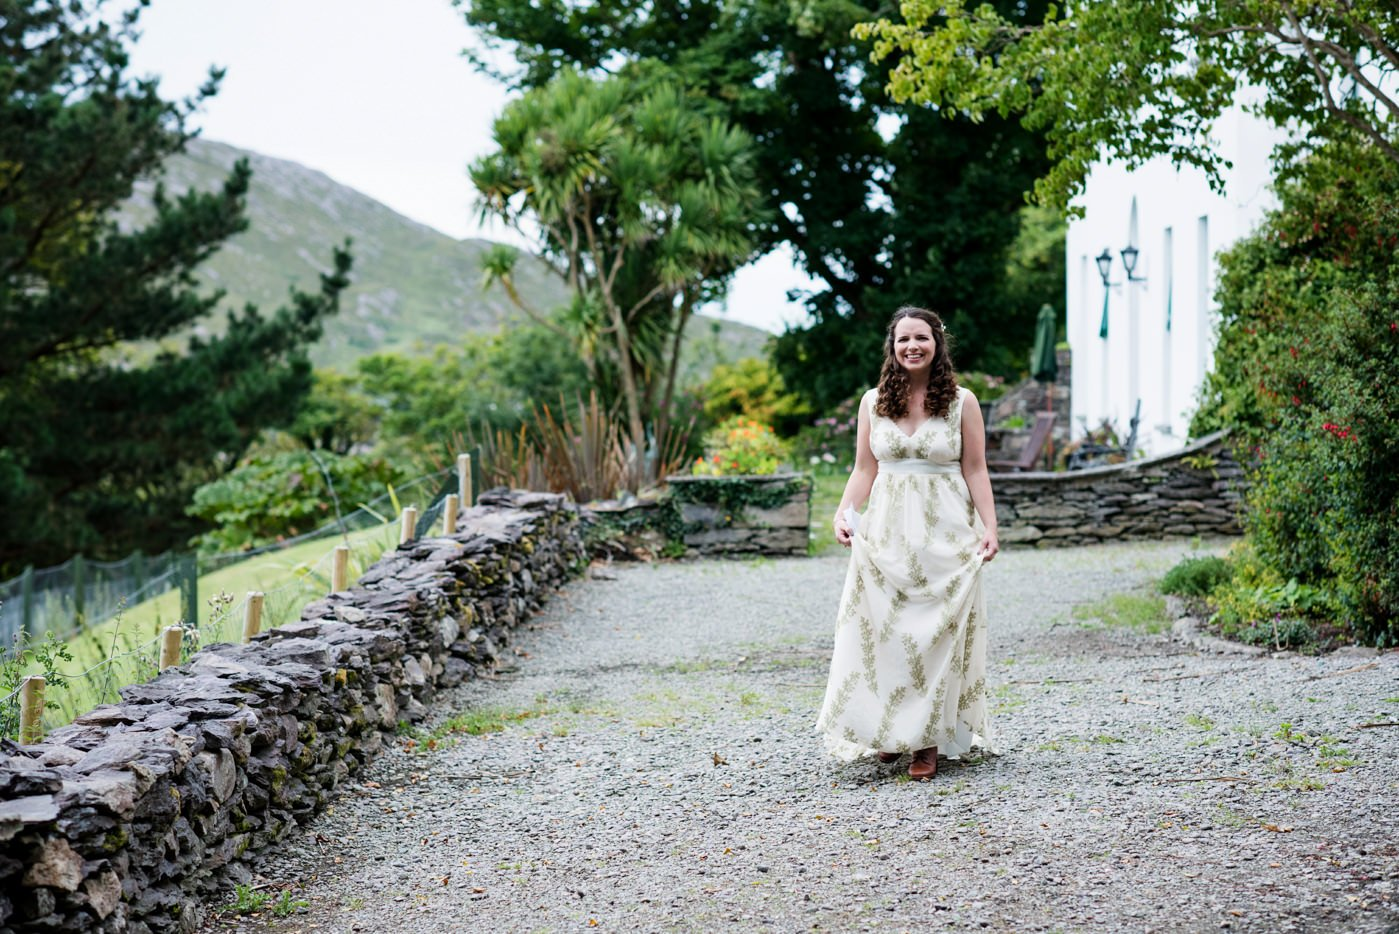 Bride wearing Indie Bride bohemian dress Co Kerry Ireland wedding